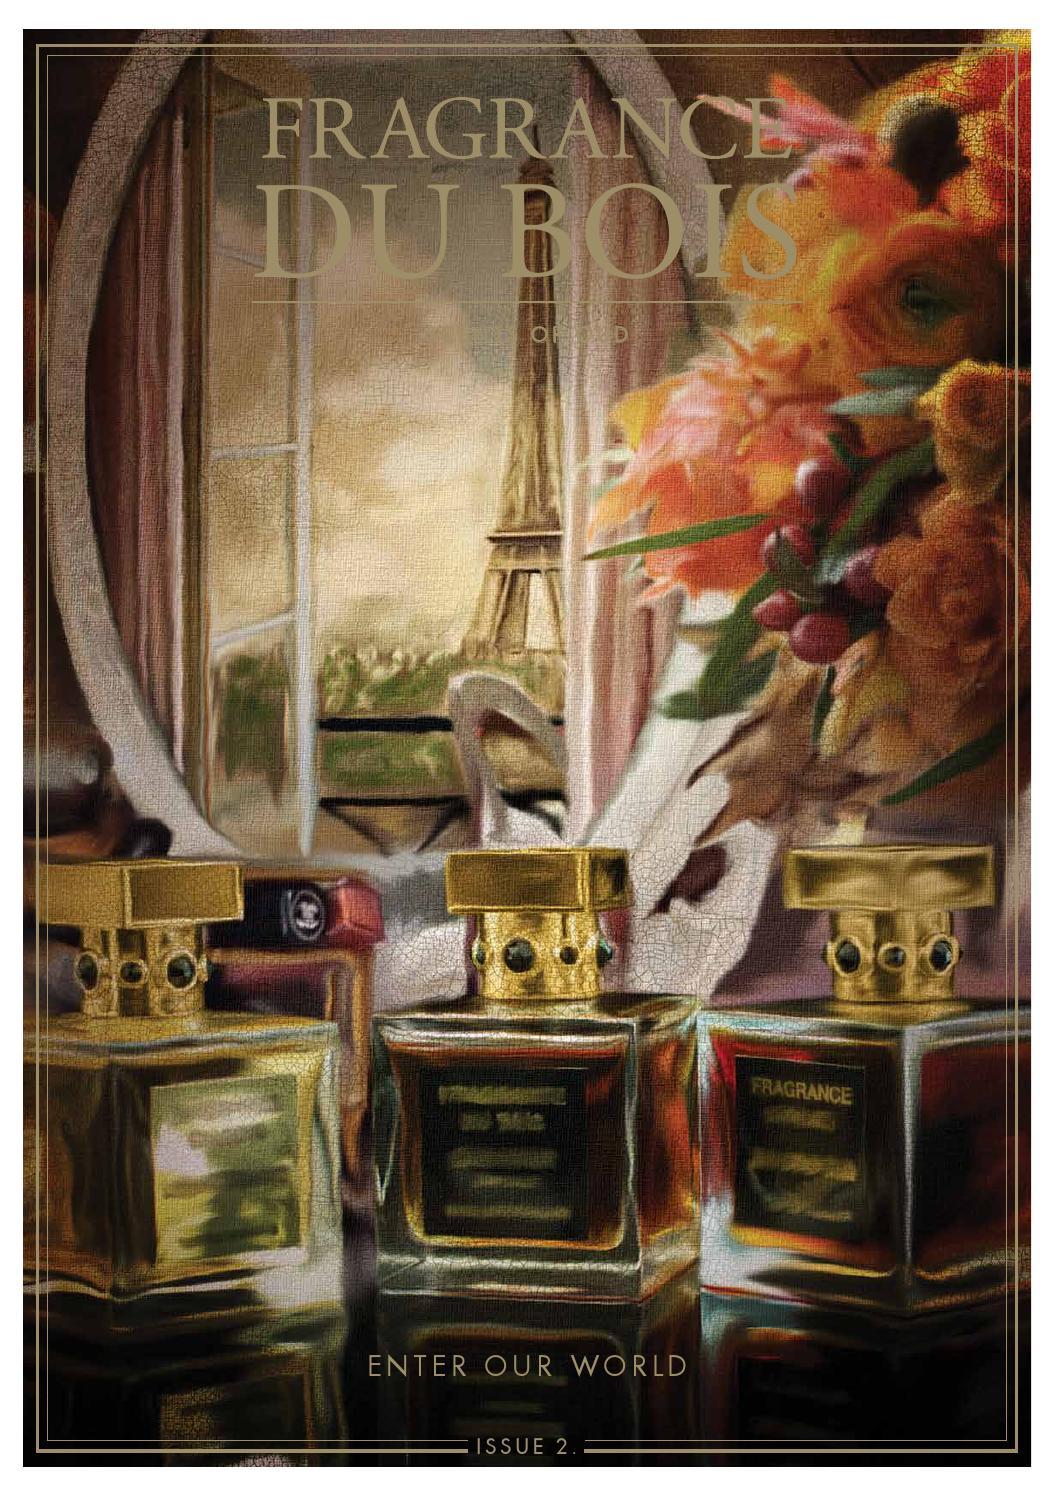 yves saint laurent opium analysis essay by alice newton  fragrance du bois